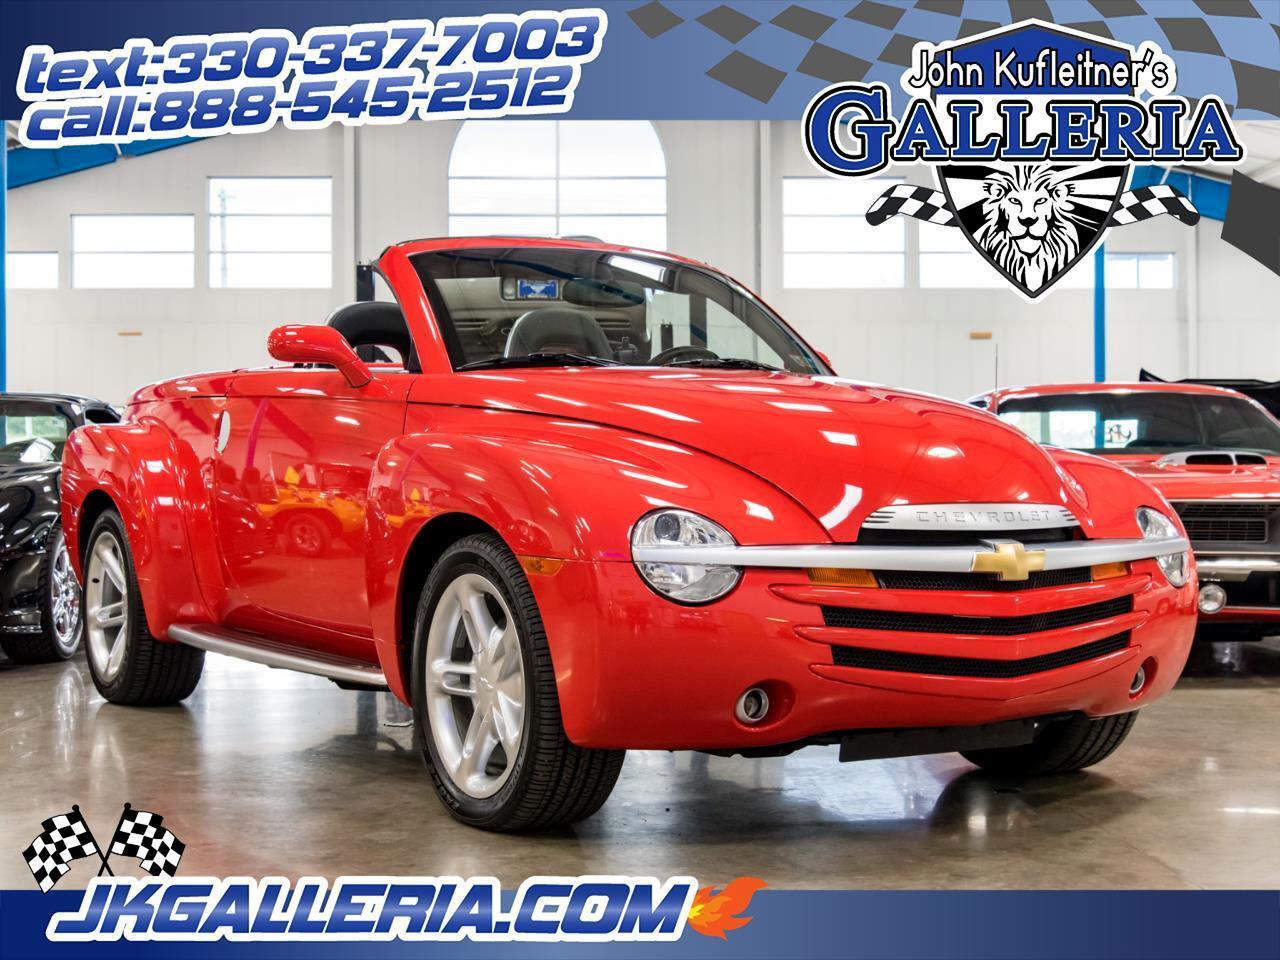 2003 Chevrolet SSR Reg Cab 116.0